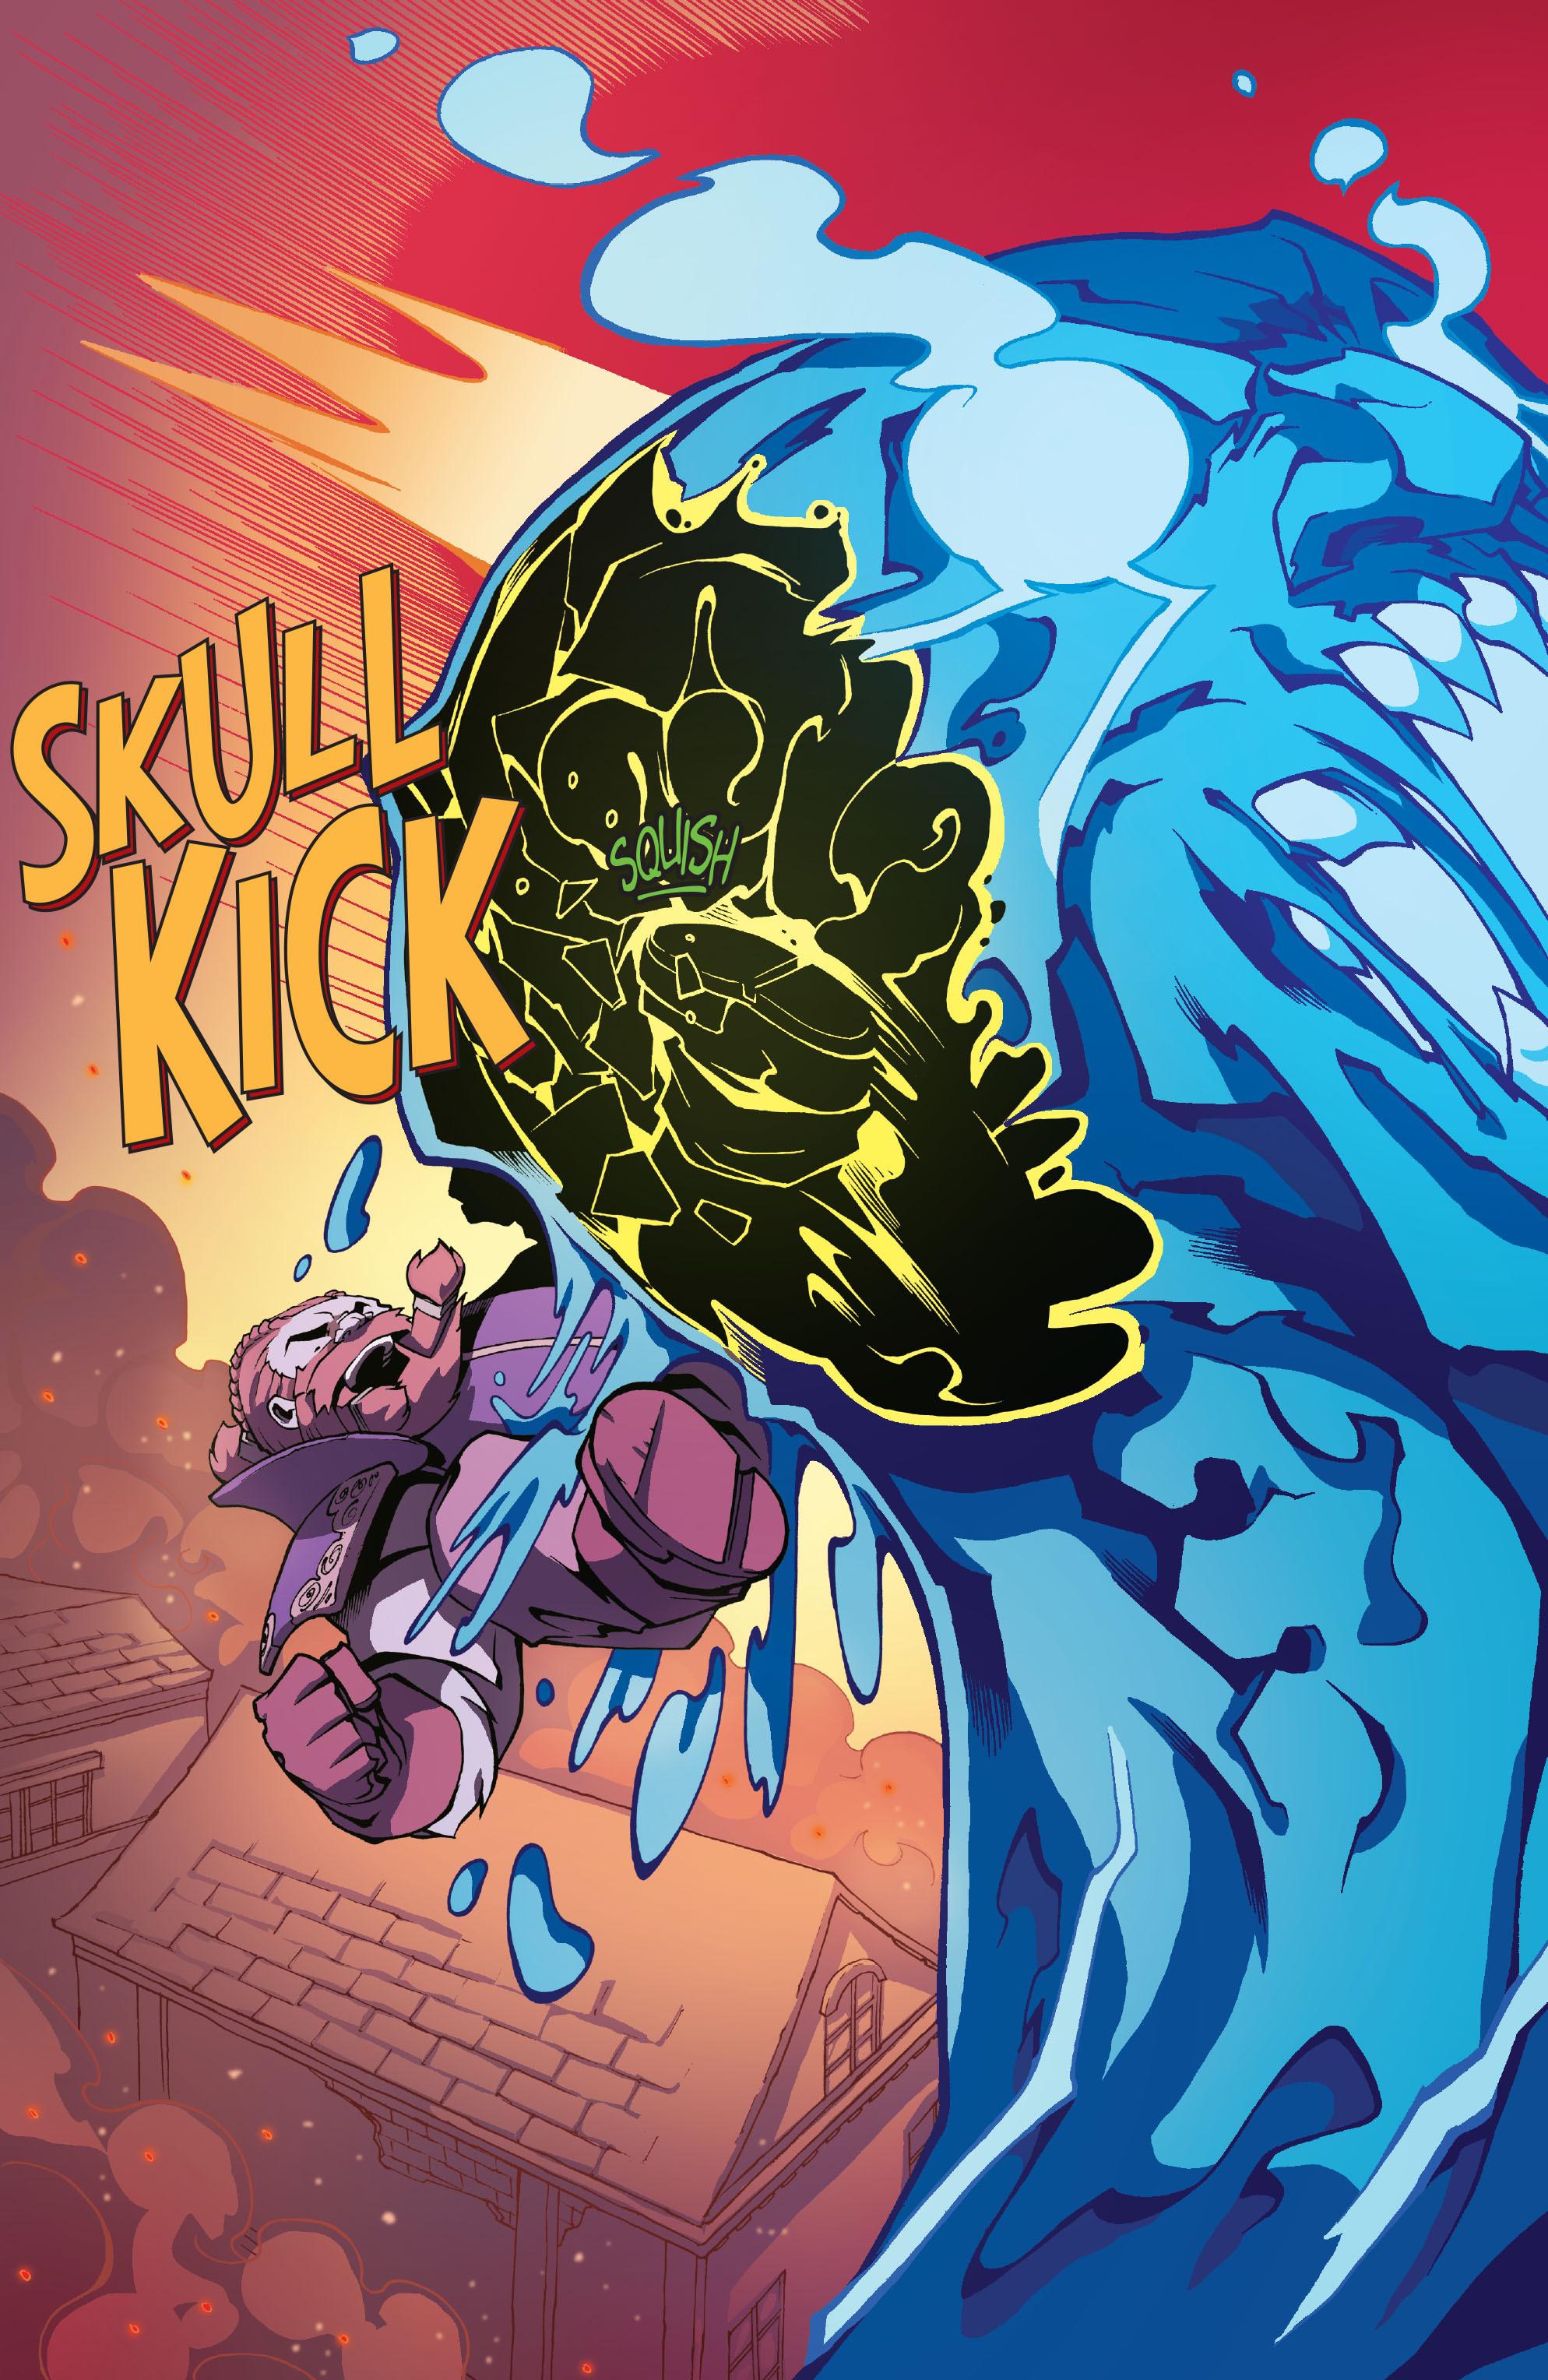 Read online Skullkickers comic -  Issue #5 - 17